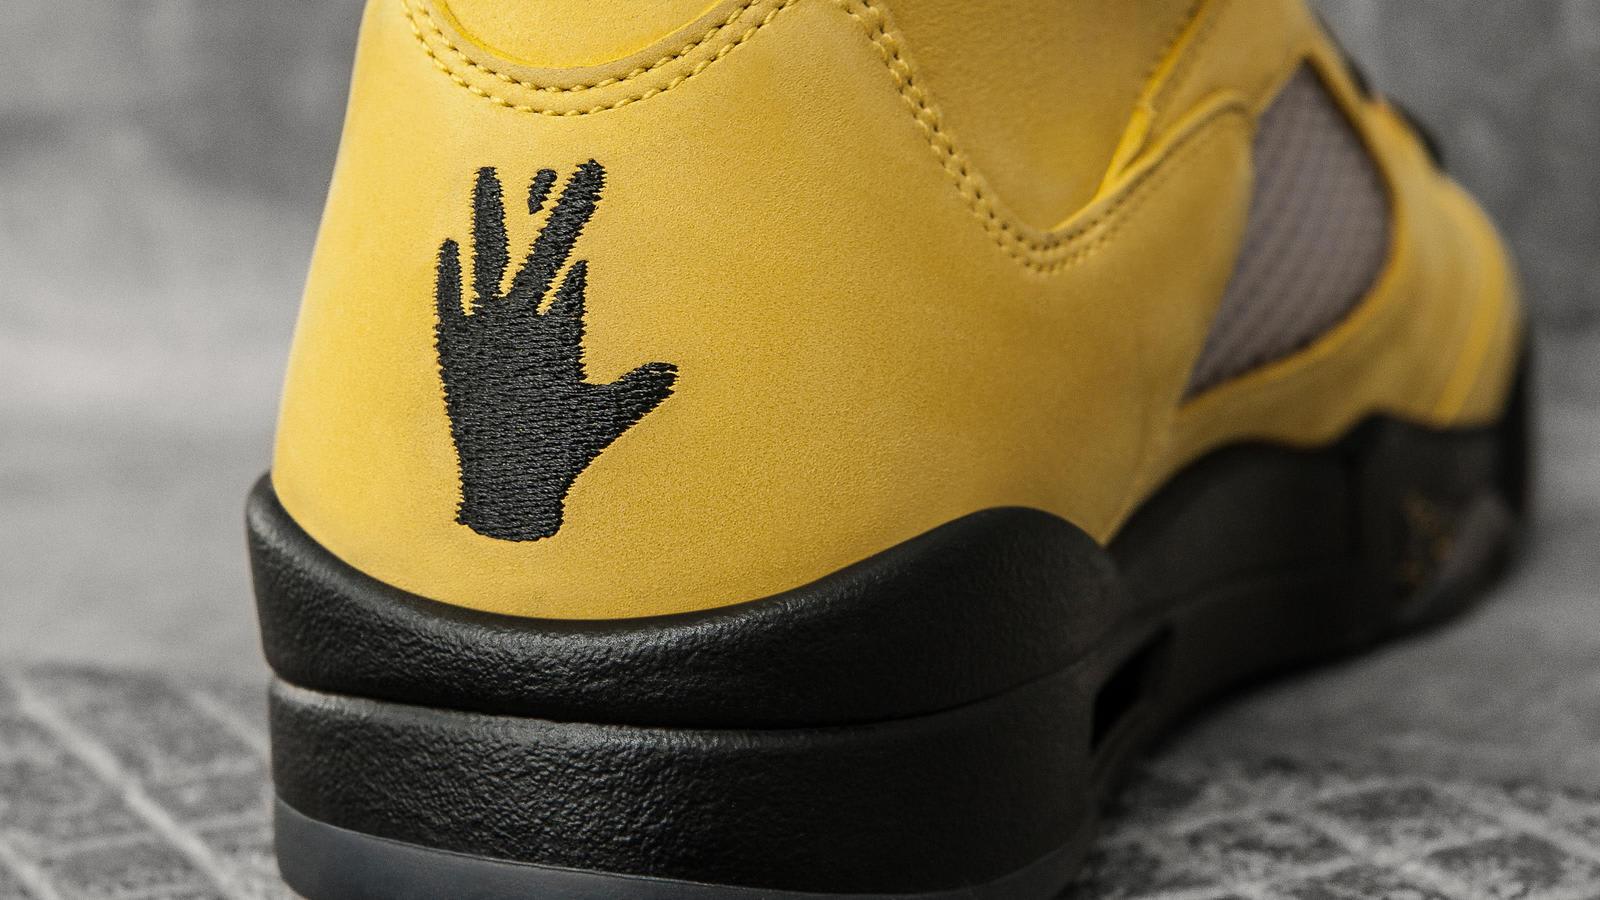 Nike Unveils the Air Jordan 5